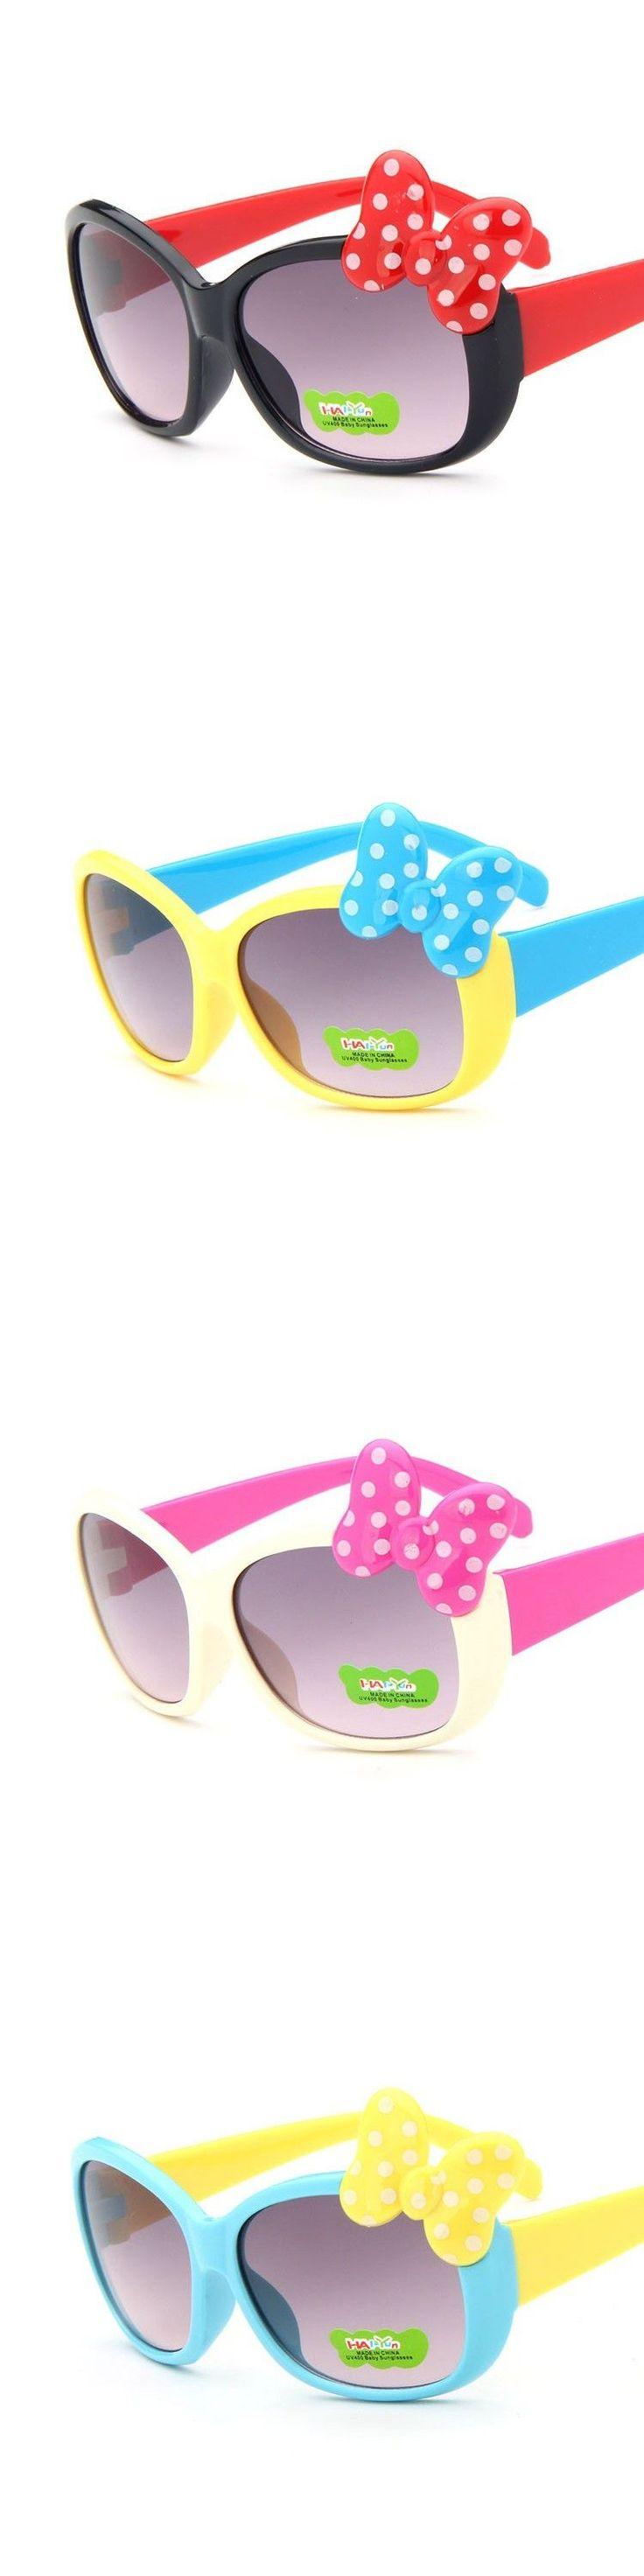 2016 New Fashion Trend Baby Kids Sunglasses UV Protection Bowknot Cosy Frame Summer Style Brand Designer Eyewear Glasses_SH314